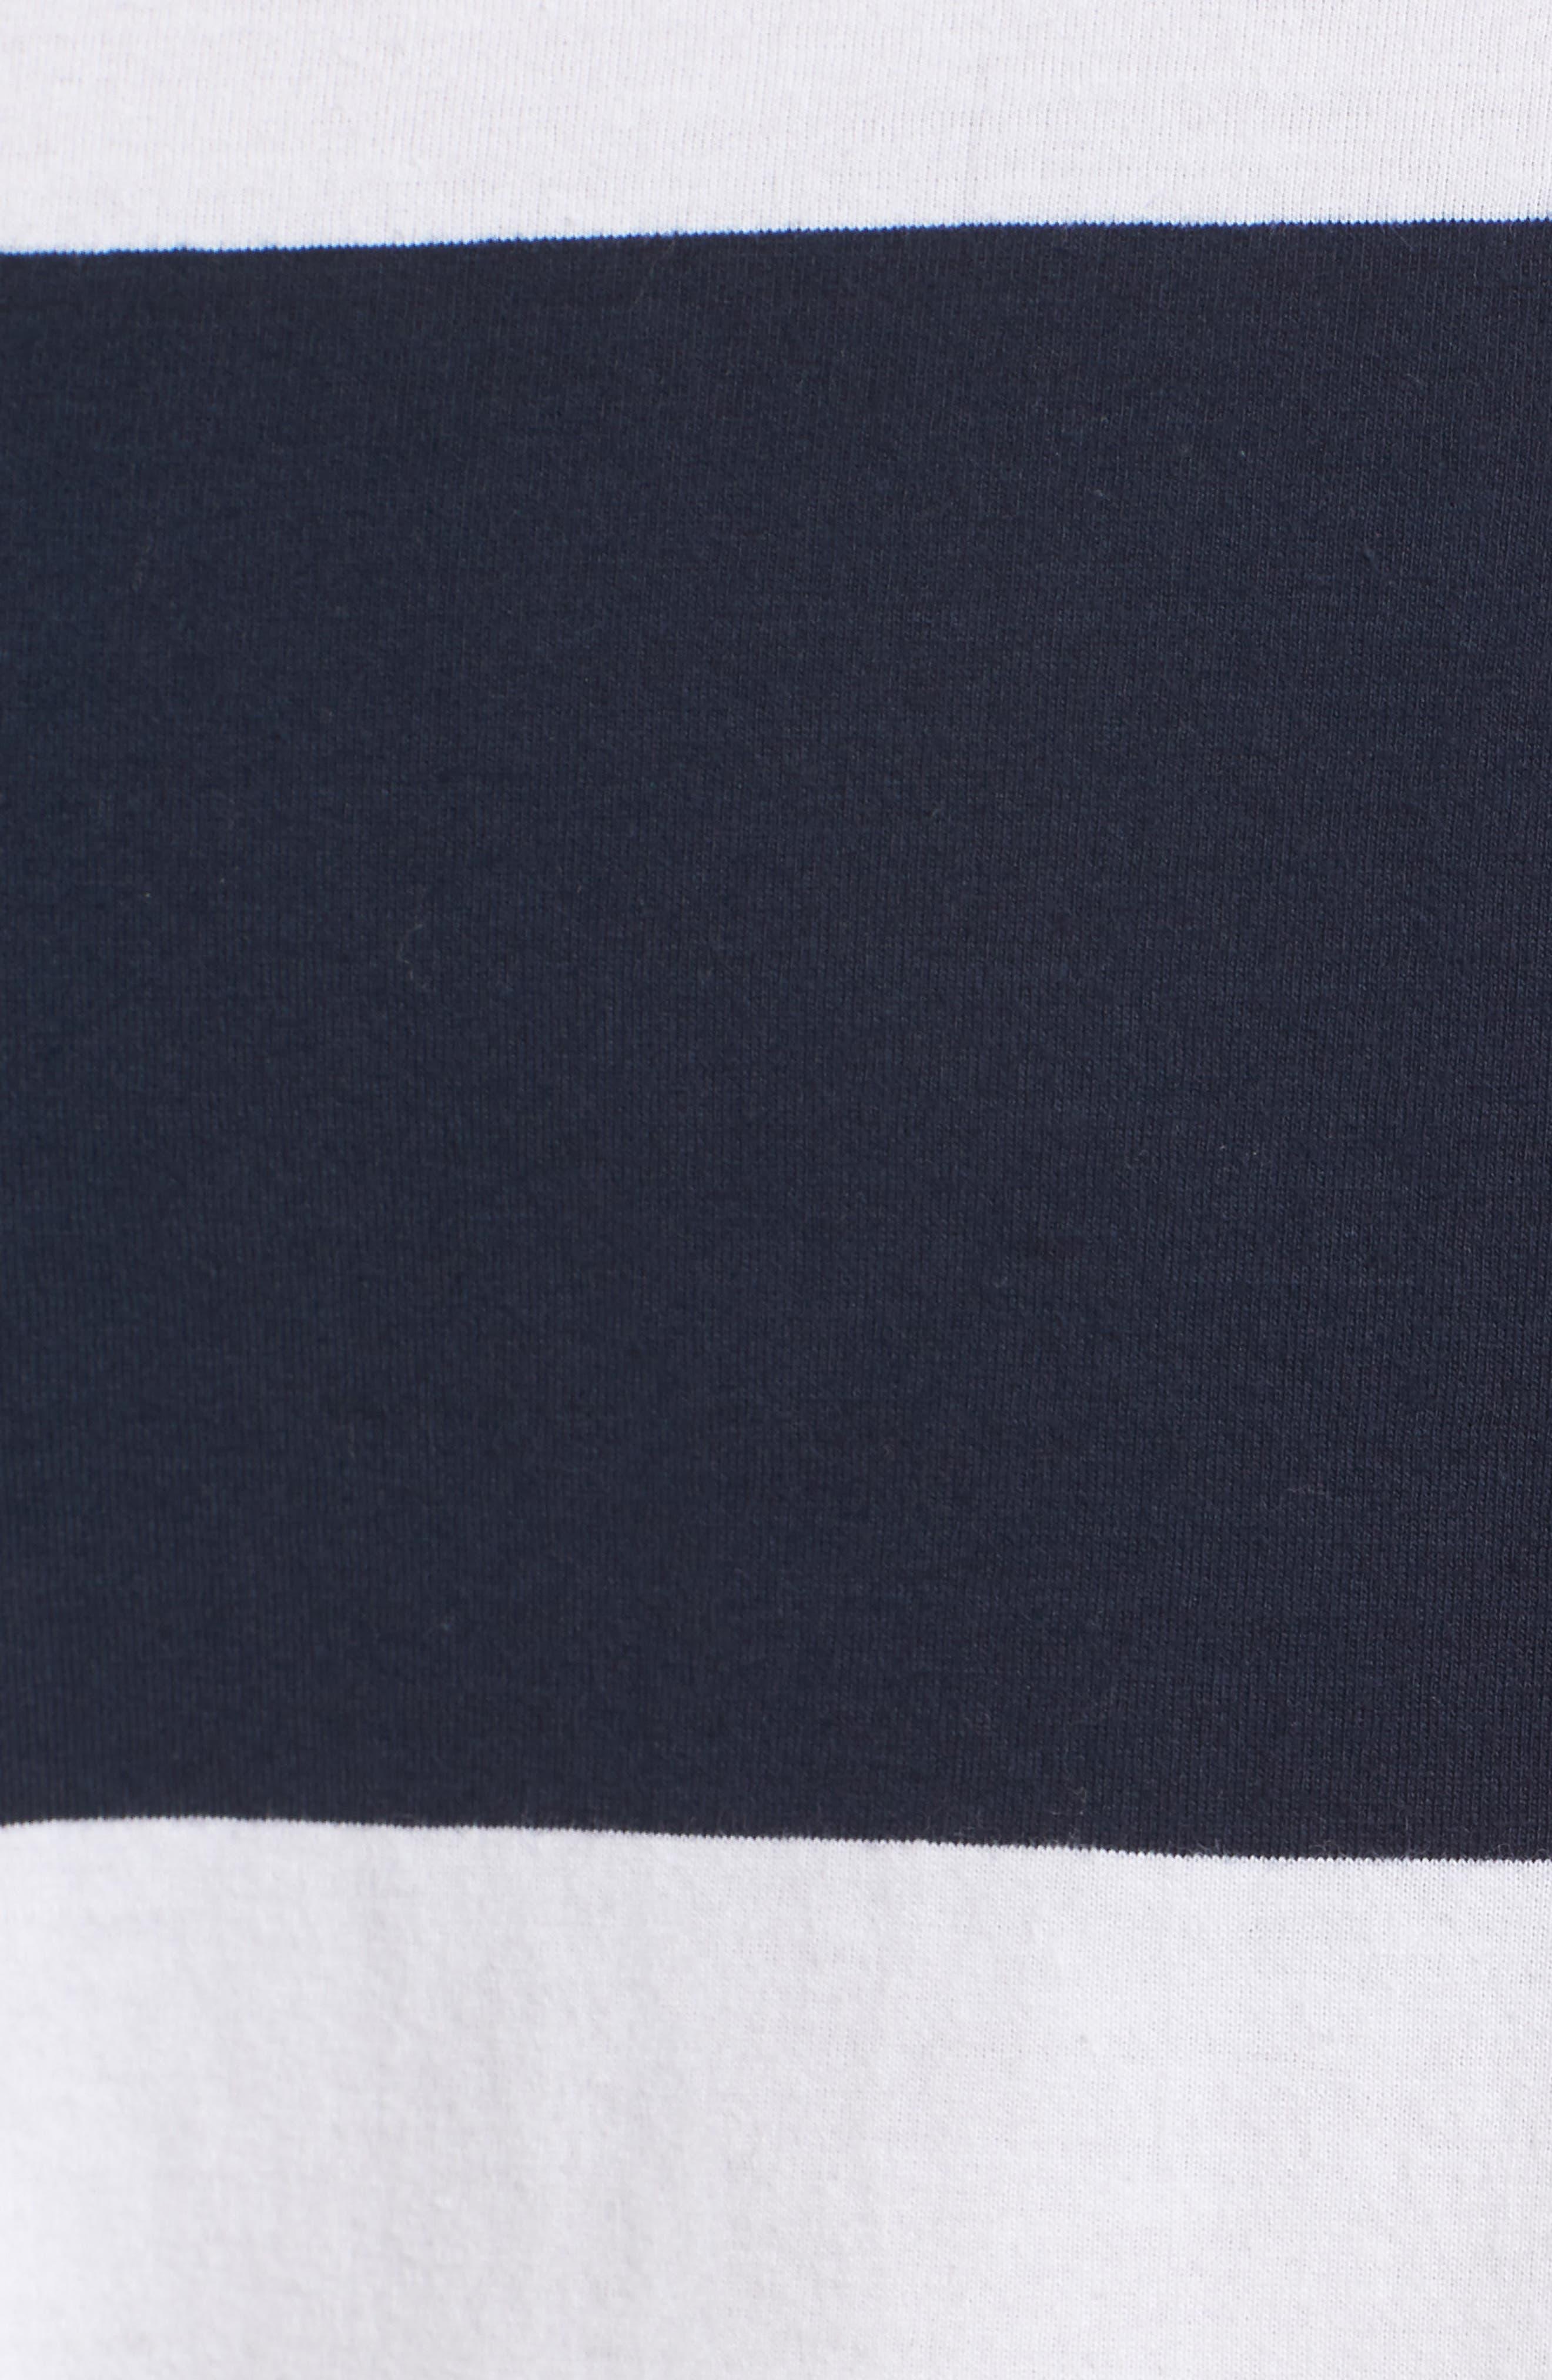 Colorblock Pocket T-Shirt,                             Alternate thumbnail 5, color,                             121